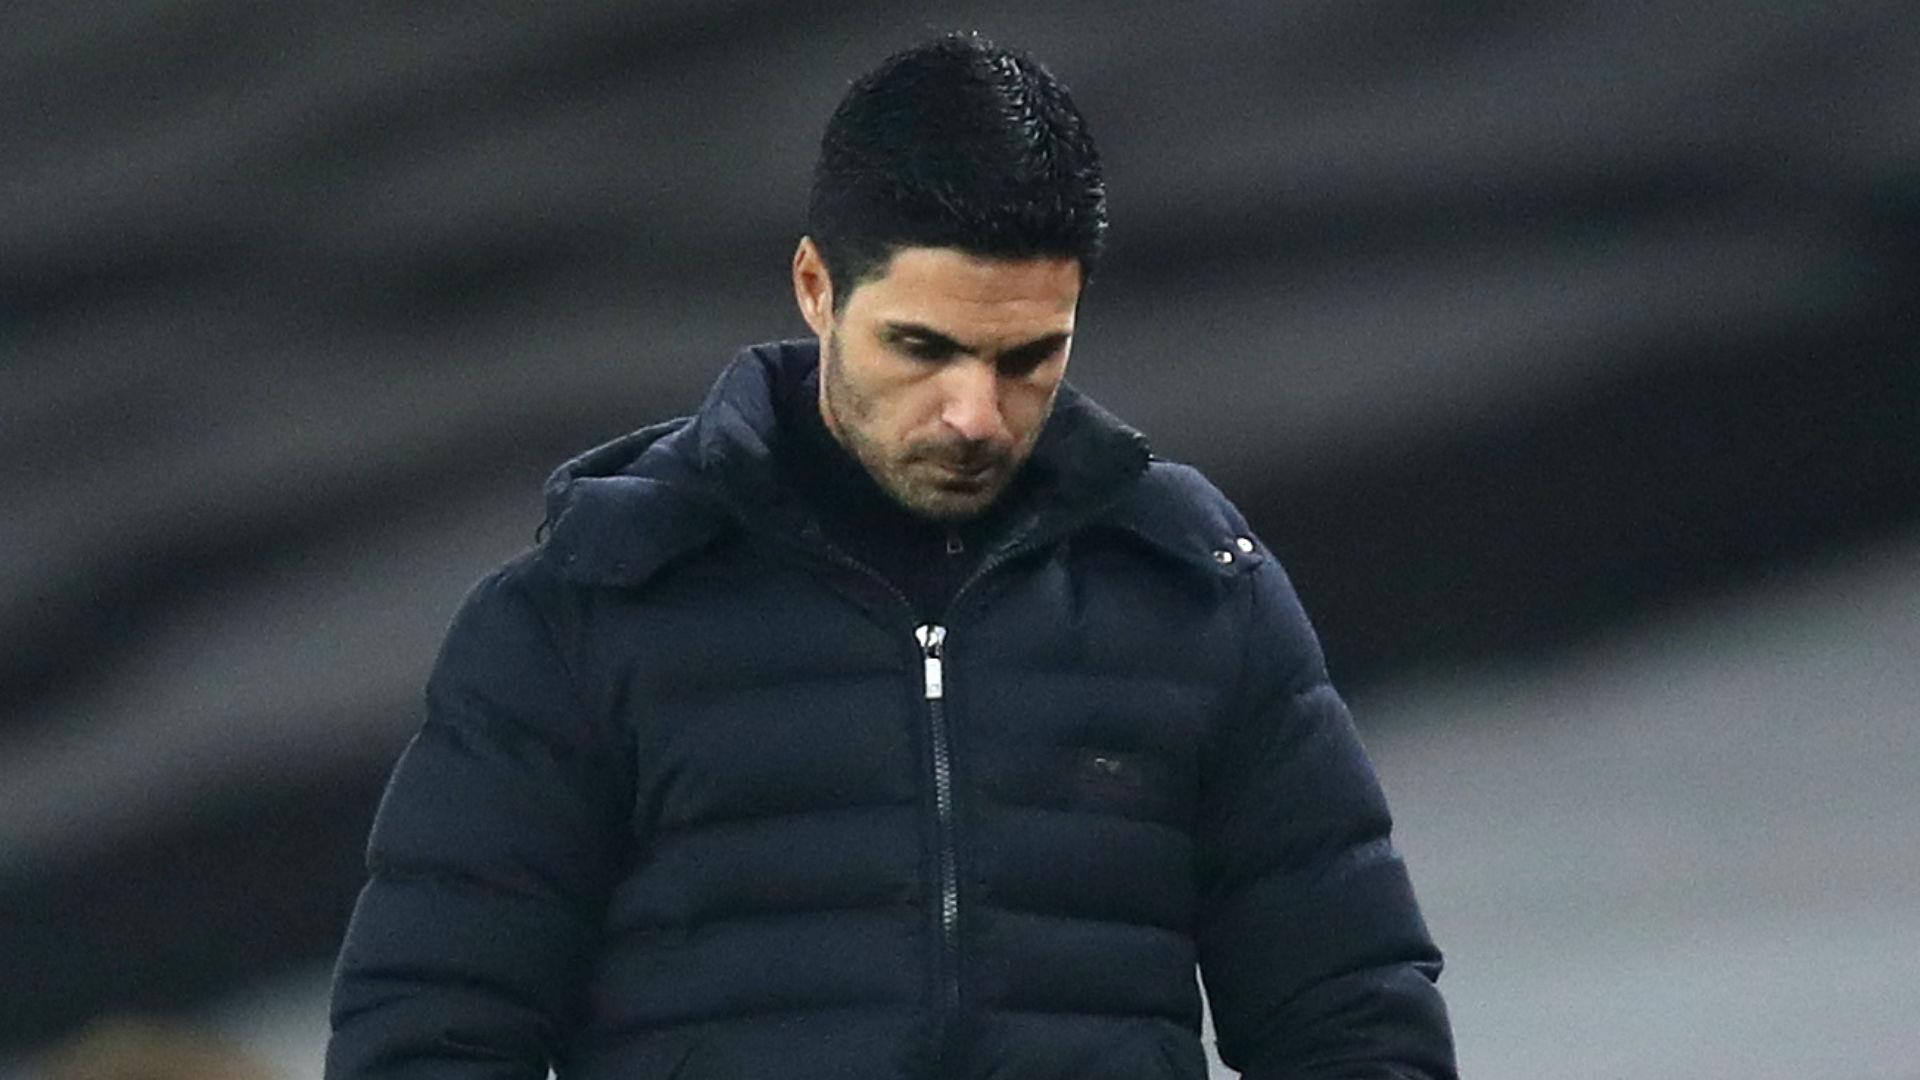 We're in a big fight – Arteta's Arsenal 'hurt' as dismal run rolls on